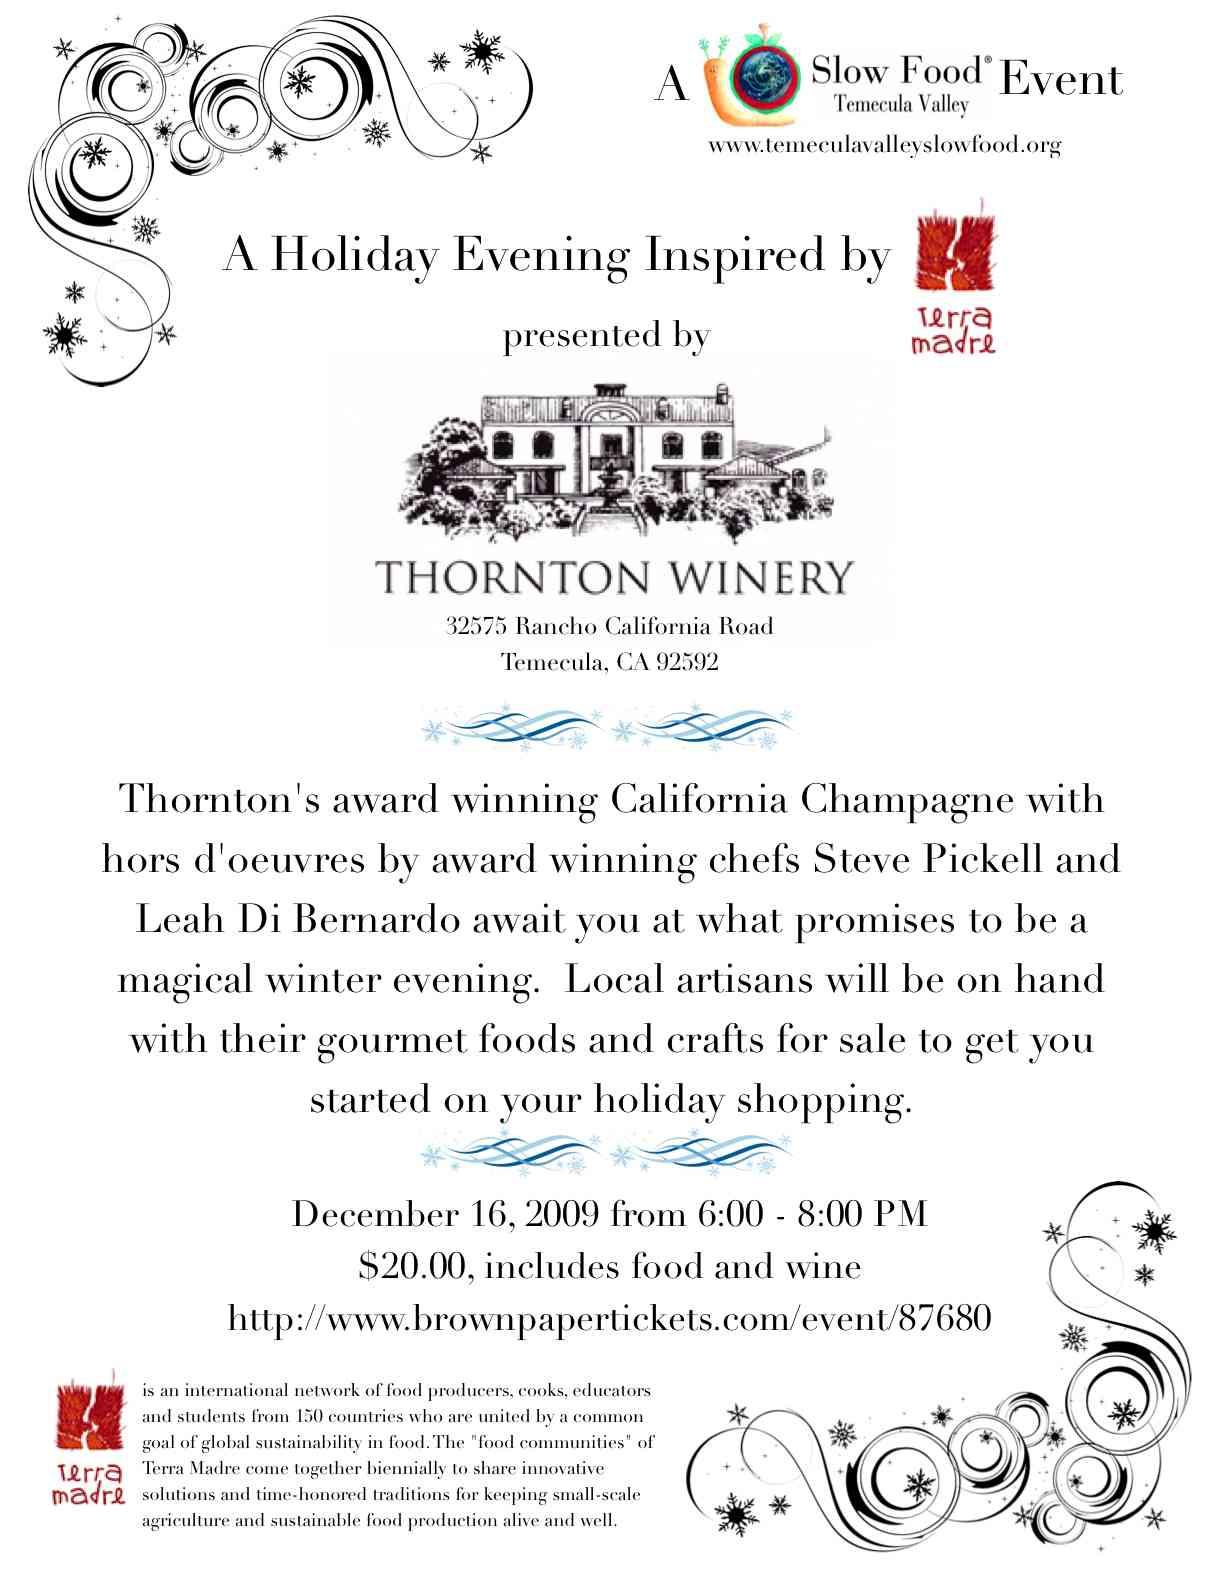 December Thornton Event Flyer.jpg